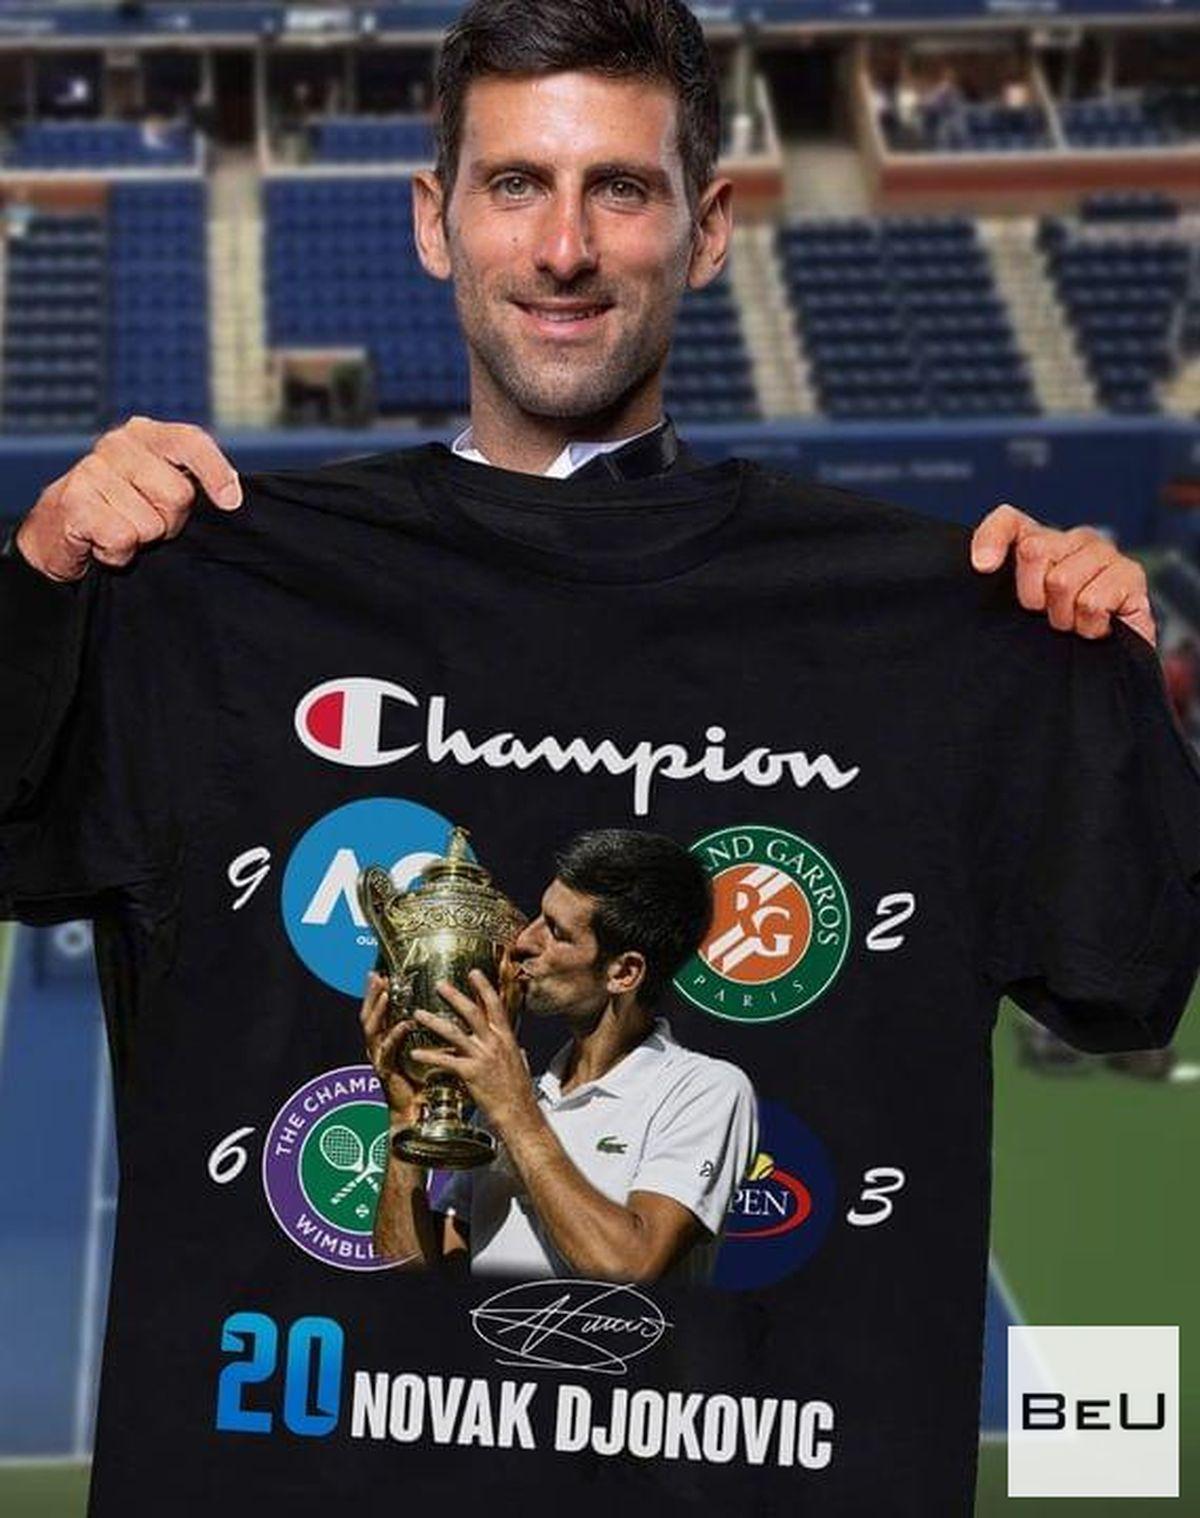 20 Novak Djokovic Champion Shirtv